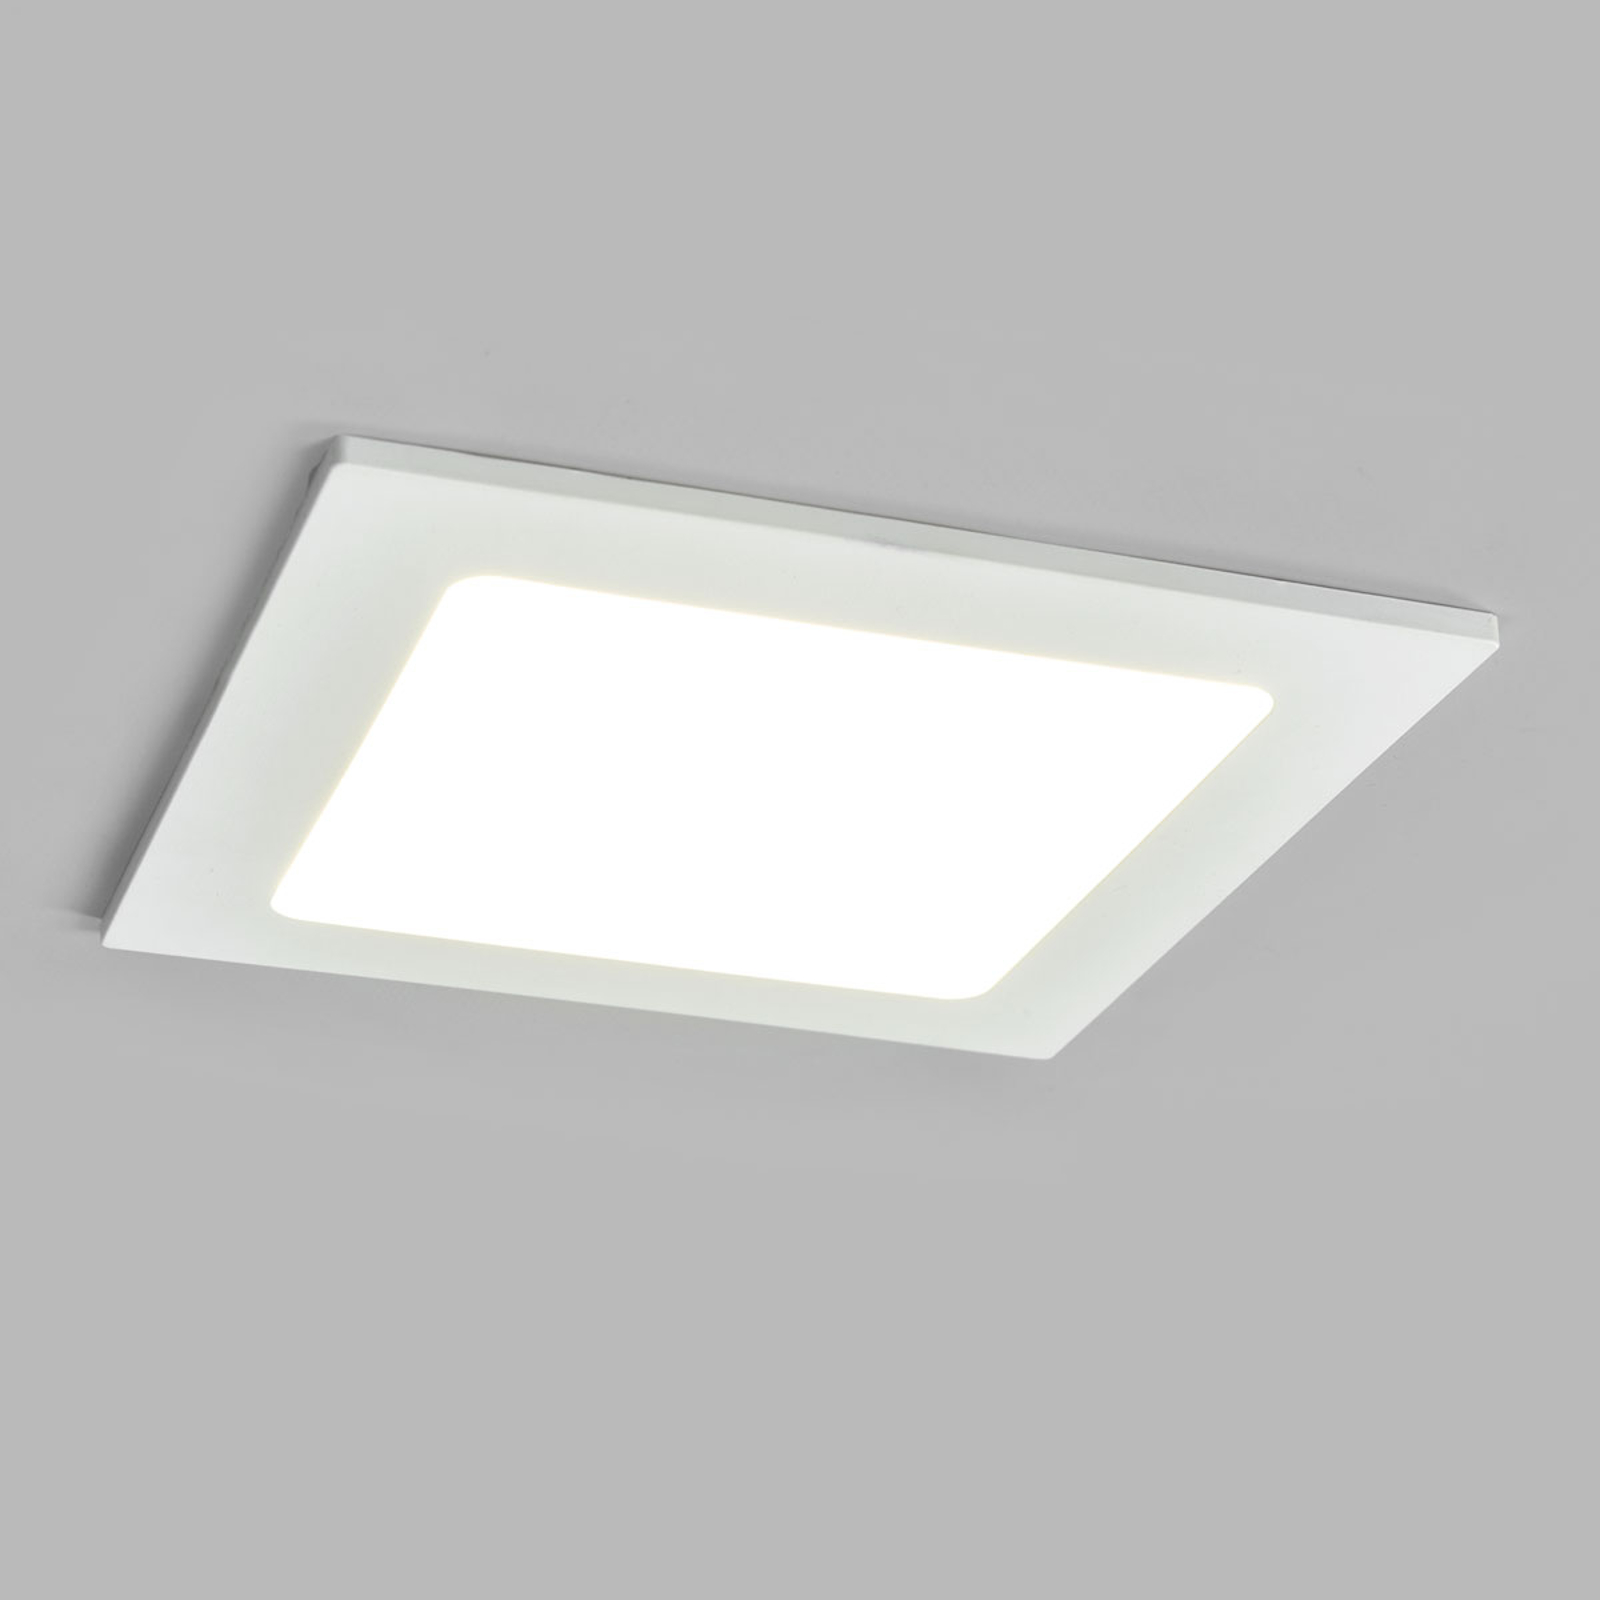 LED-Einbaustrahler Joki weiß 4000K eckig 16,5cm